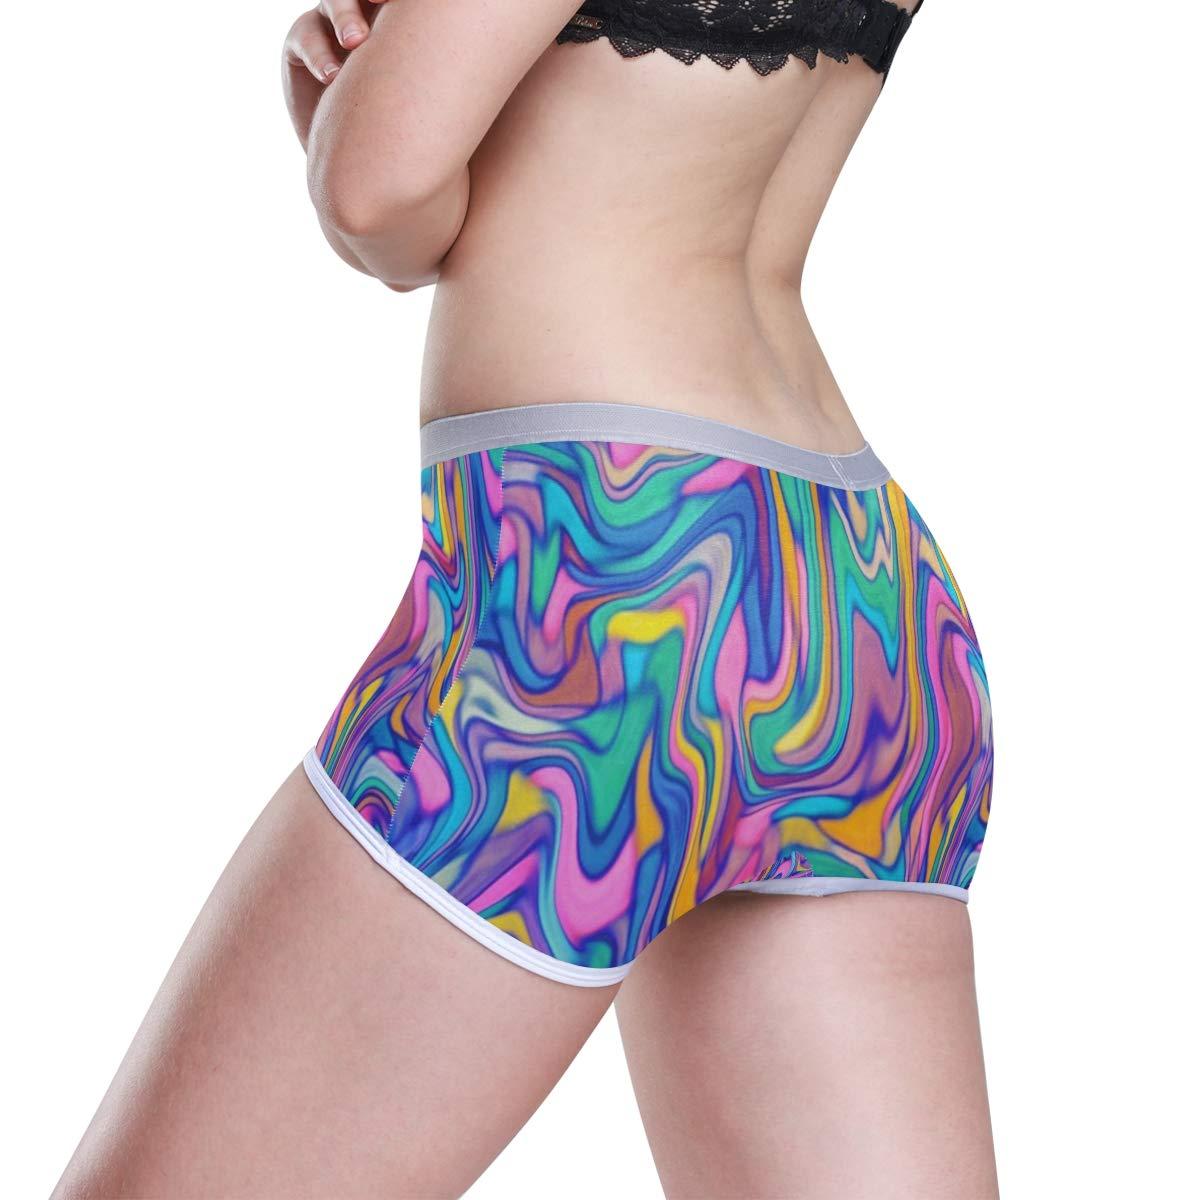 HangWang Colorful Bright Neon Boyshort Panties Womens Breathable Boyshort Hipster Panty Underwear